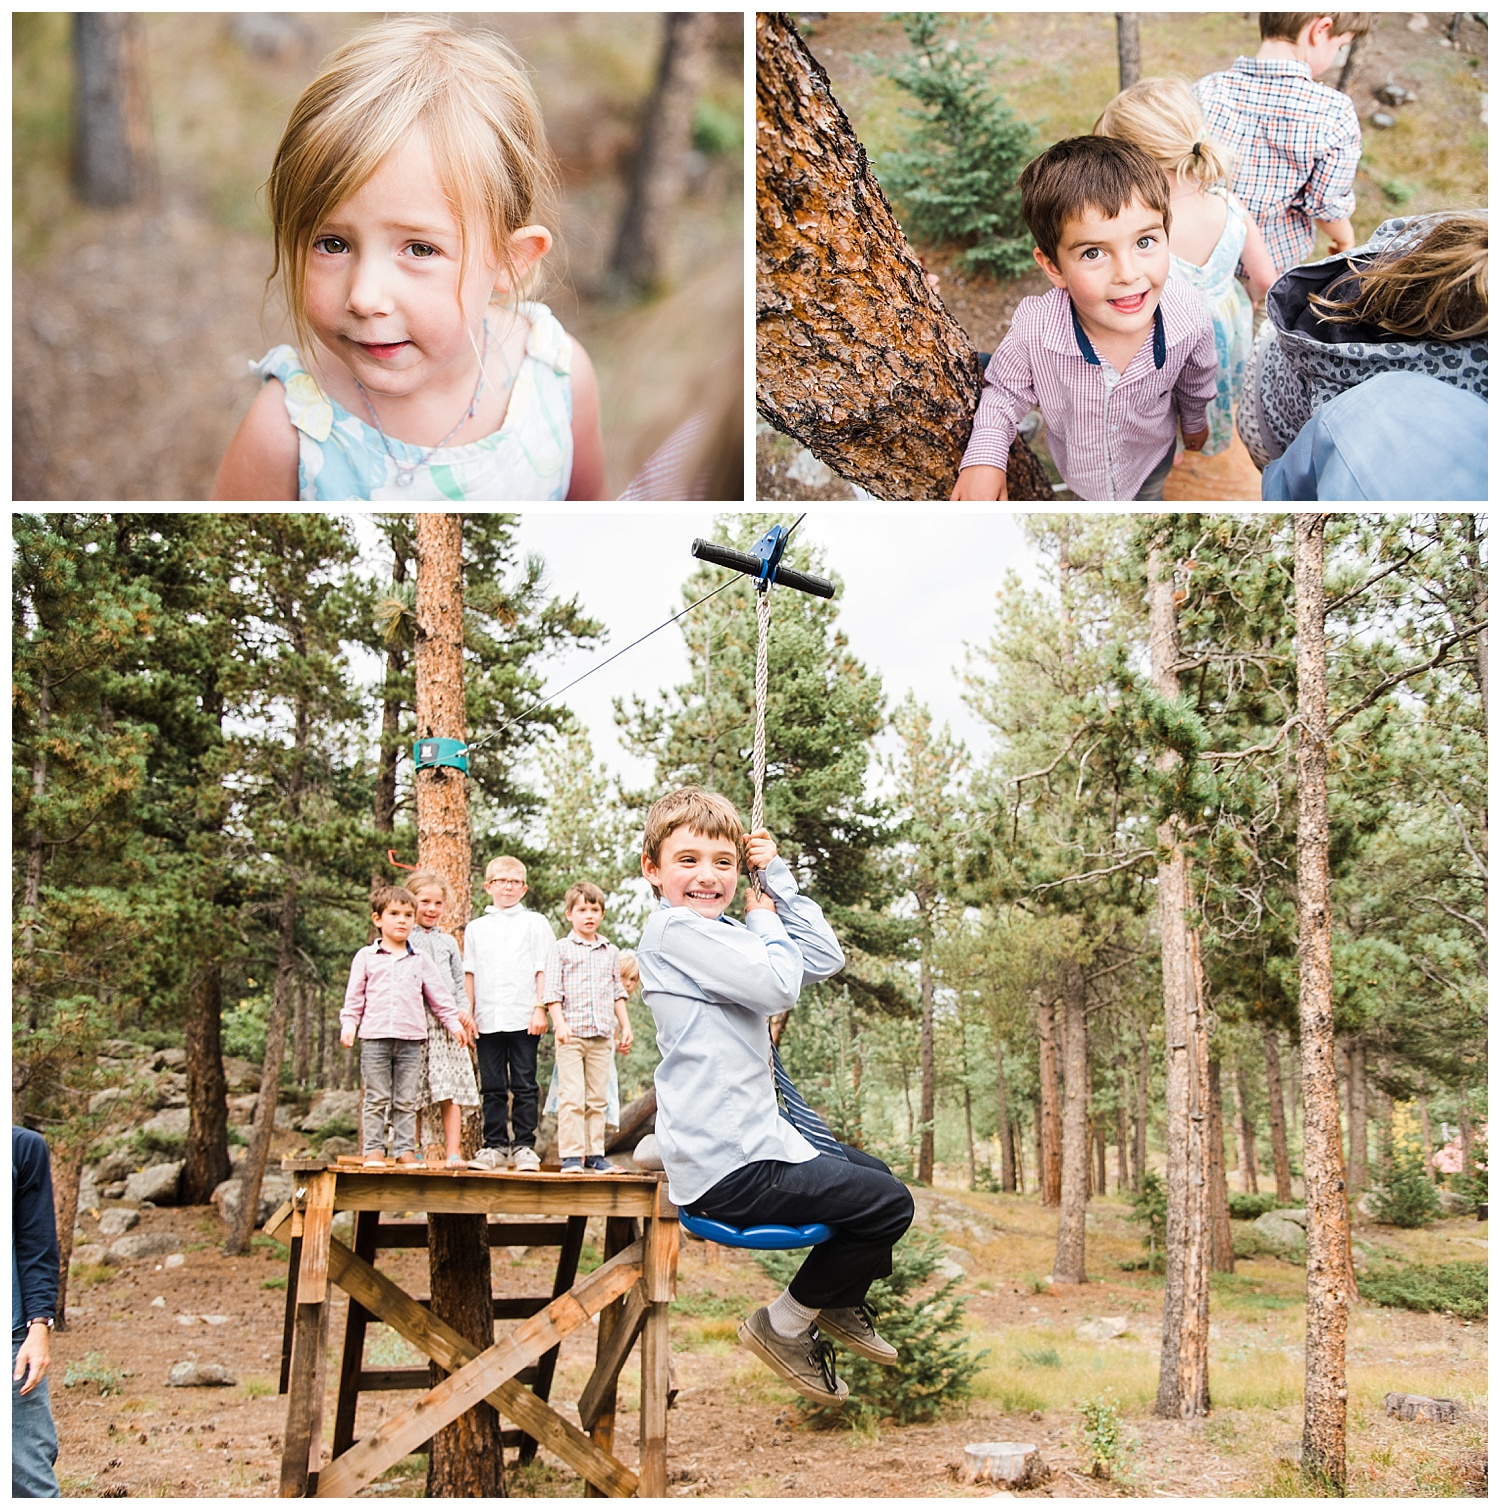 Gold_Hill_Inn_Wedding_Boulder_CO_Apollo_Fields_418.jpg